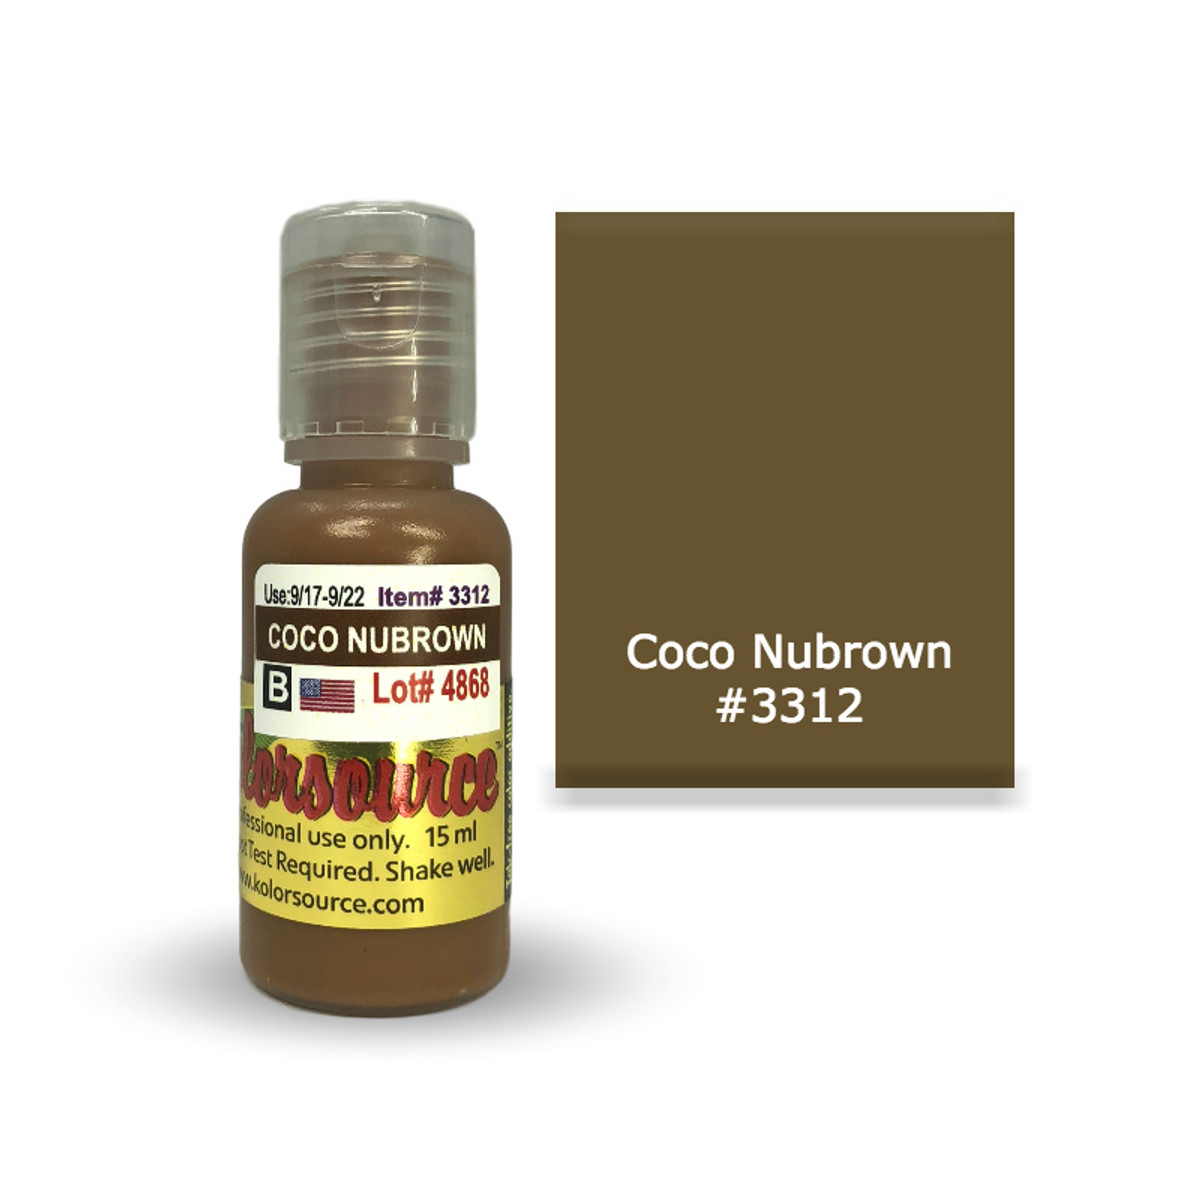 Kolorsource Permanent Makeup Pigment (PMU) Coco Nubrown #3312 - 15ml